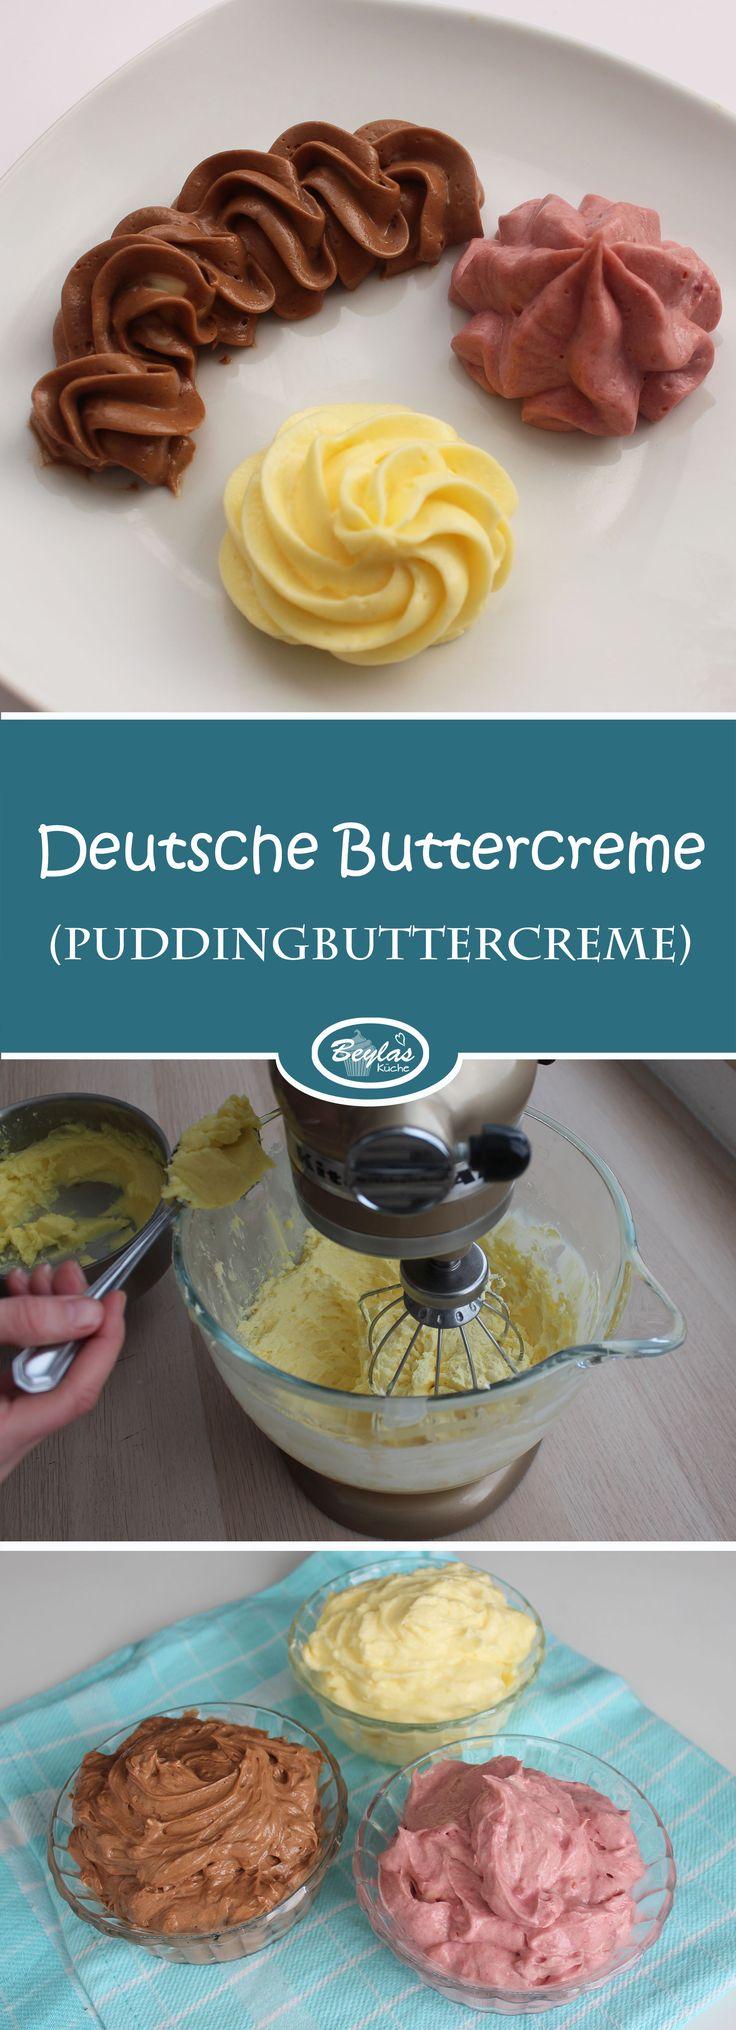 Puddingbuttercreme (Deutsche Buttercreme) – Kuchen und Torten neu